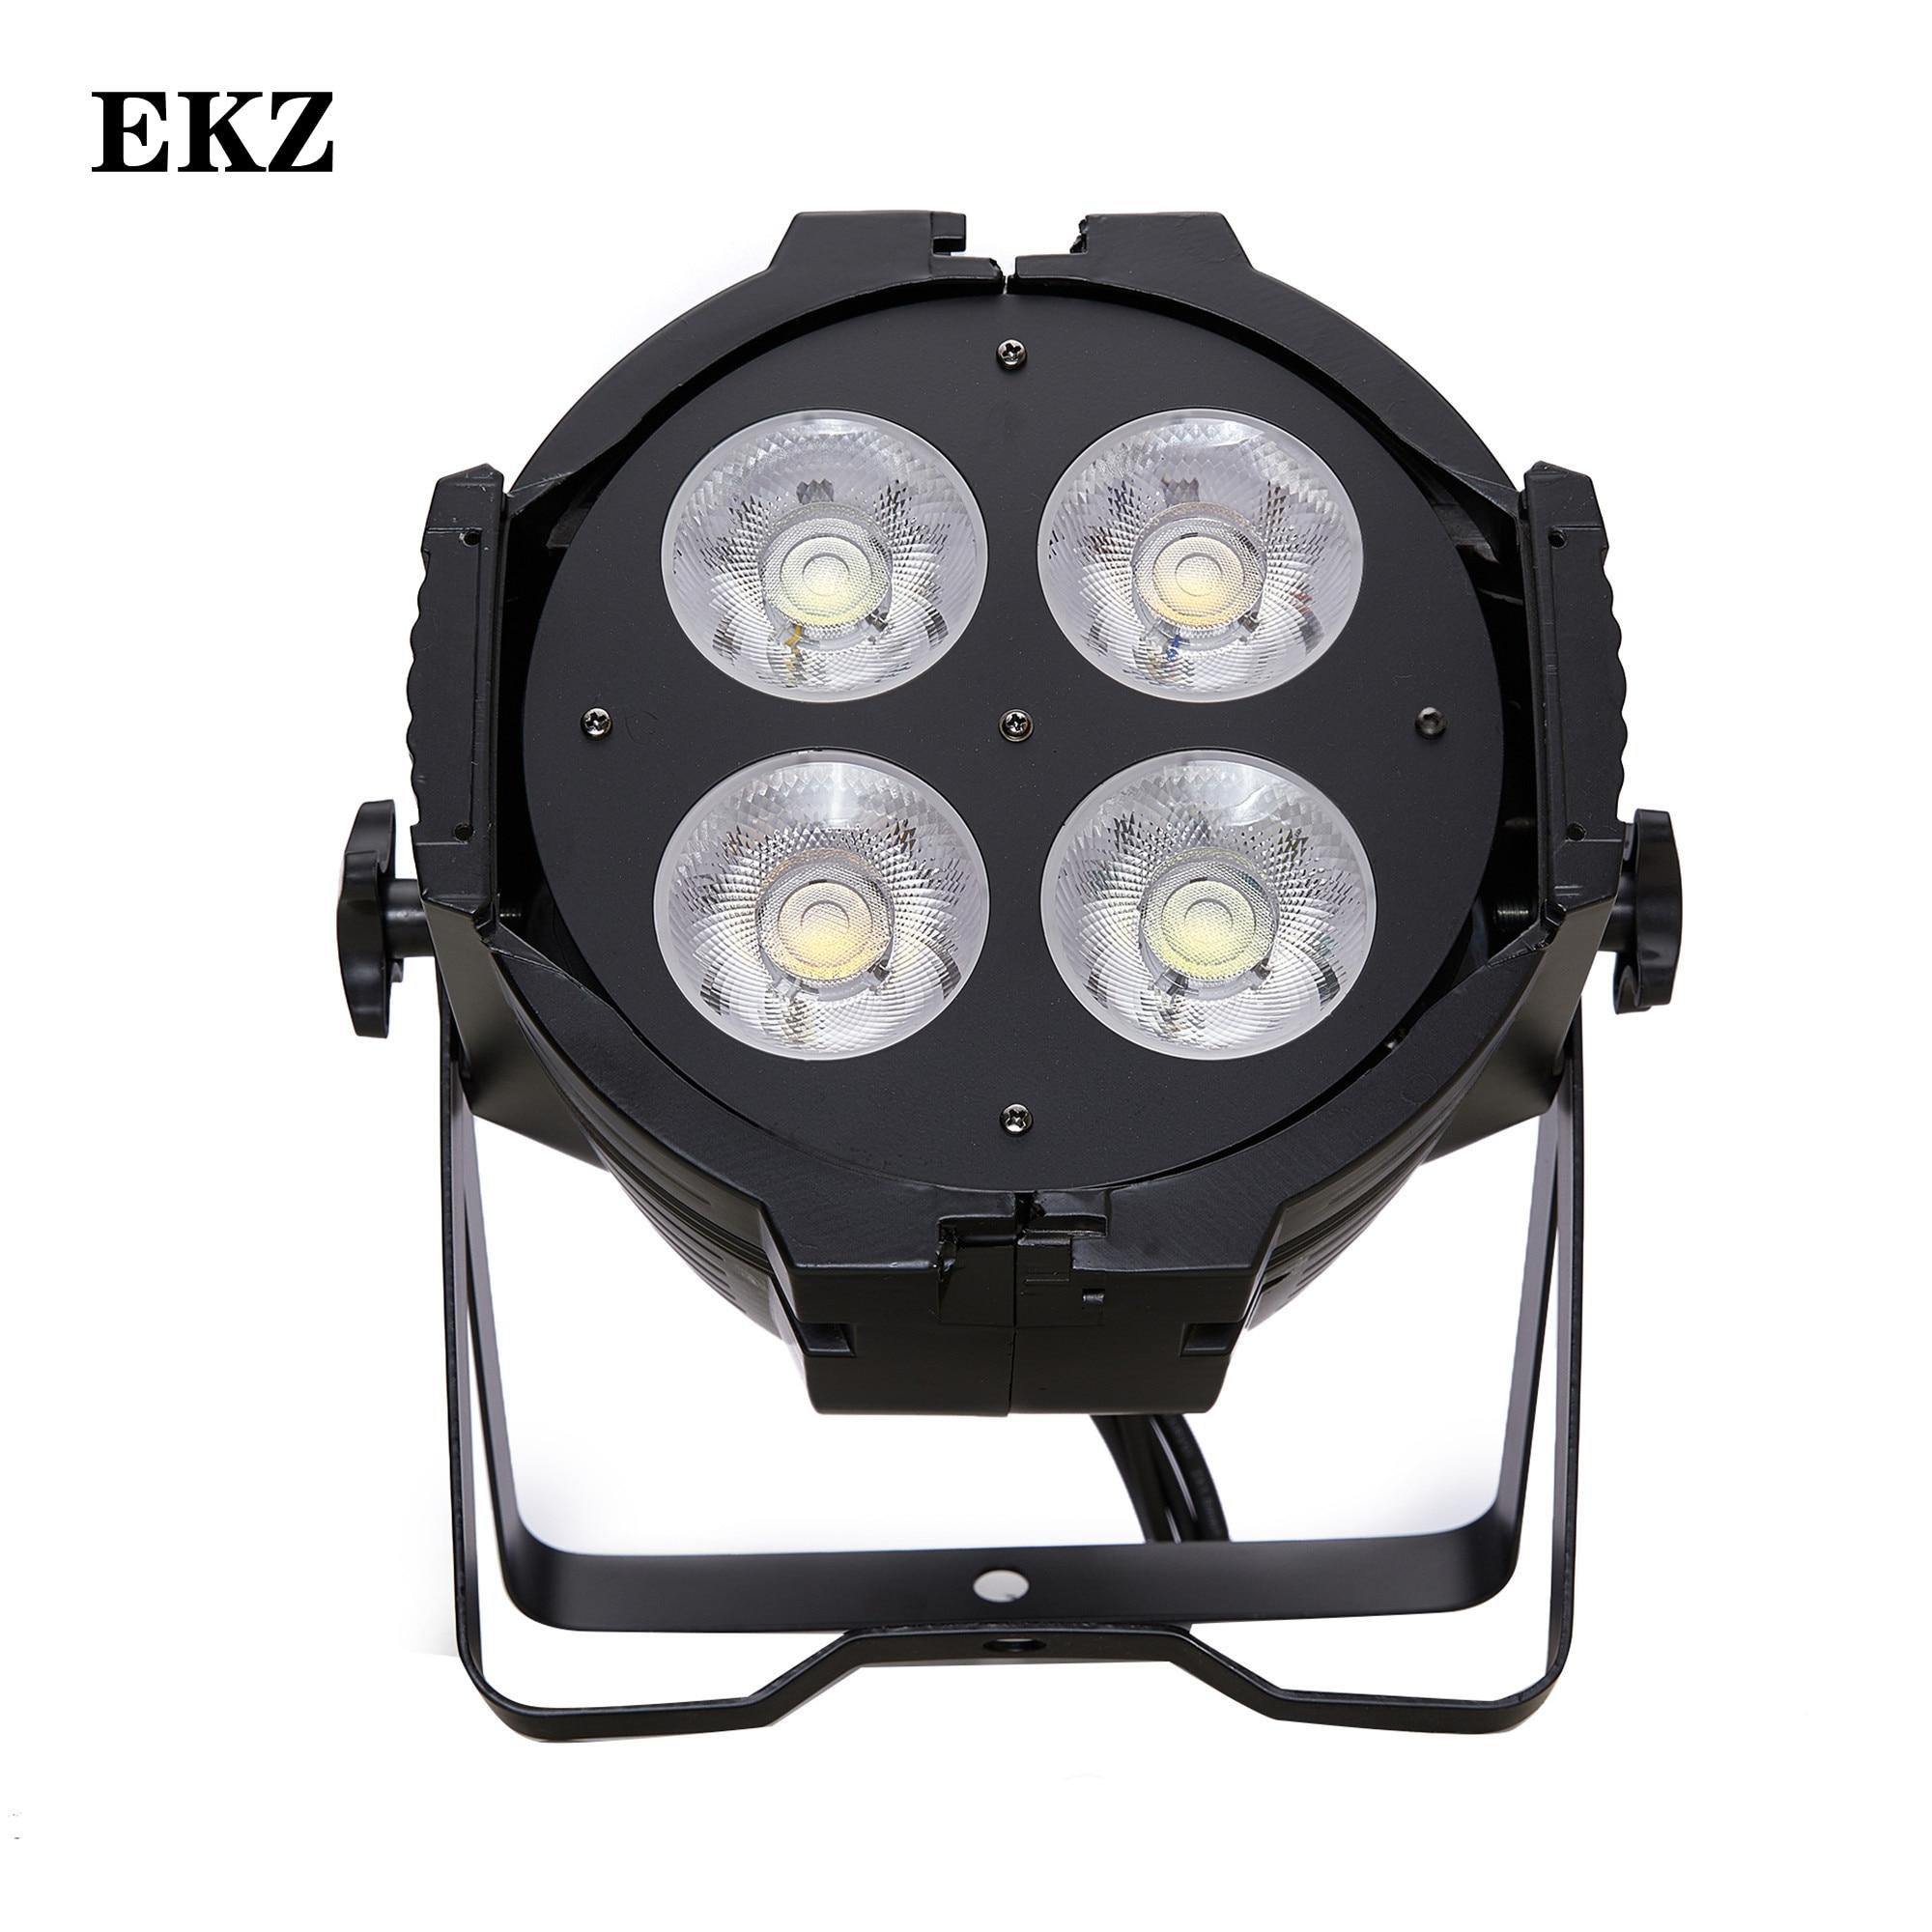 EKZ-200W COB 4x50 واط كول الأبيض والأبيض الدافئة Led الاسمية يمكن 4/8 DMX DJ مرحلة الإضاءة مسرح حفلة ديسكو غسل الأضواء